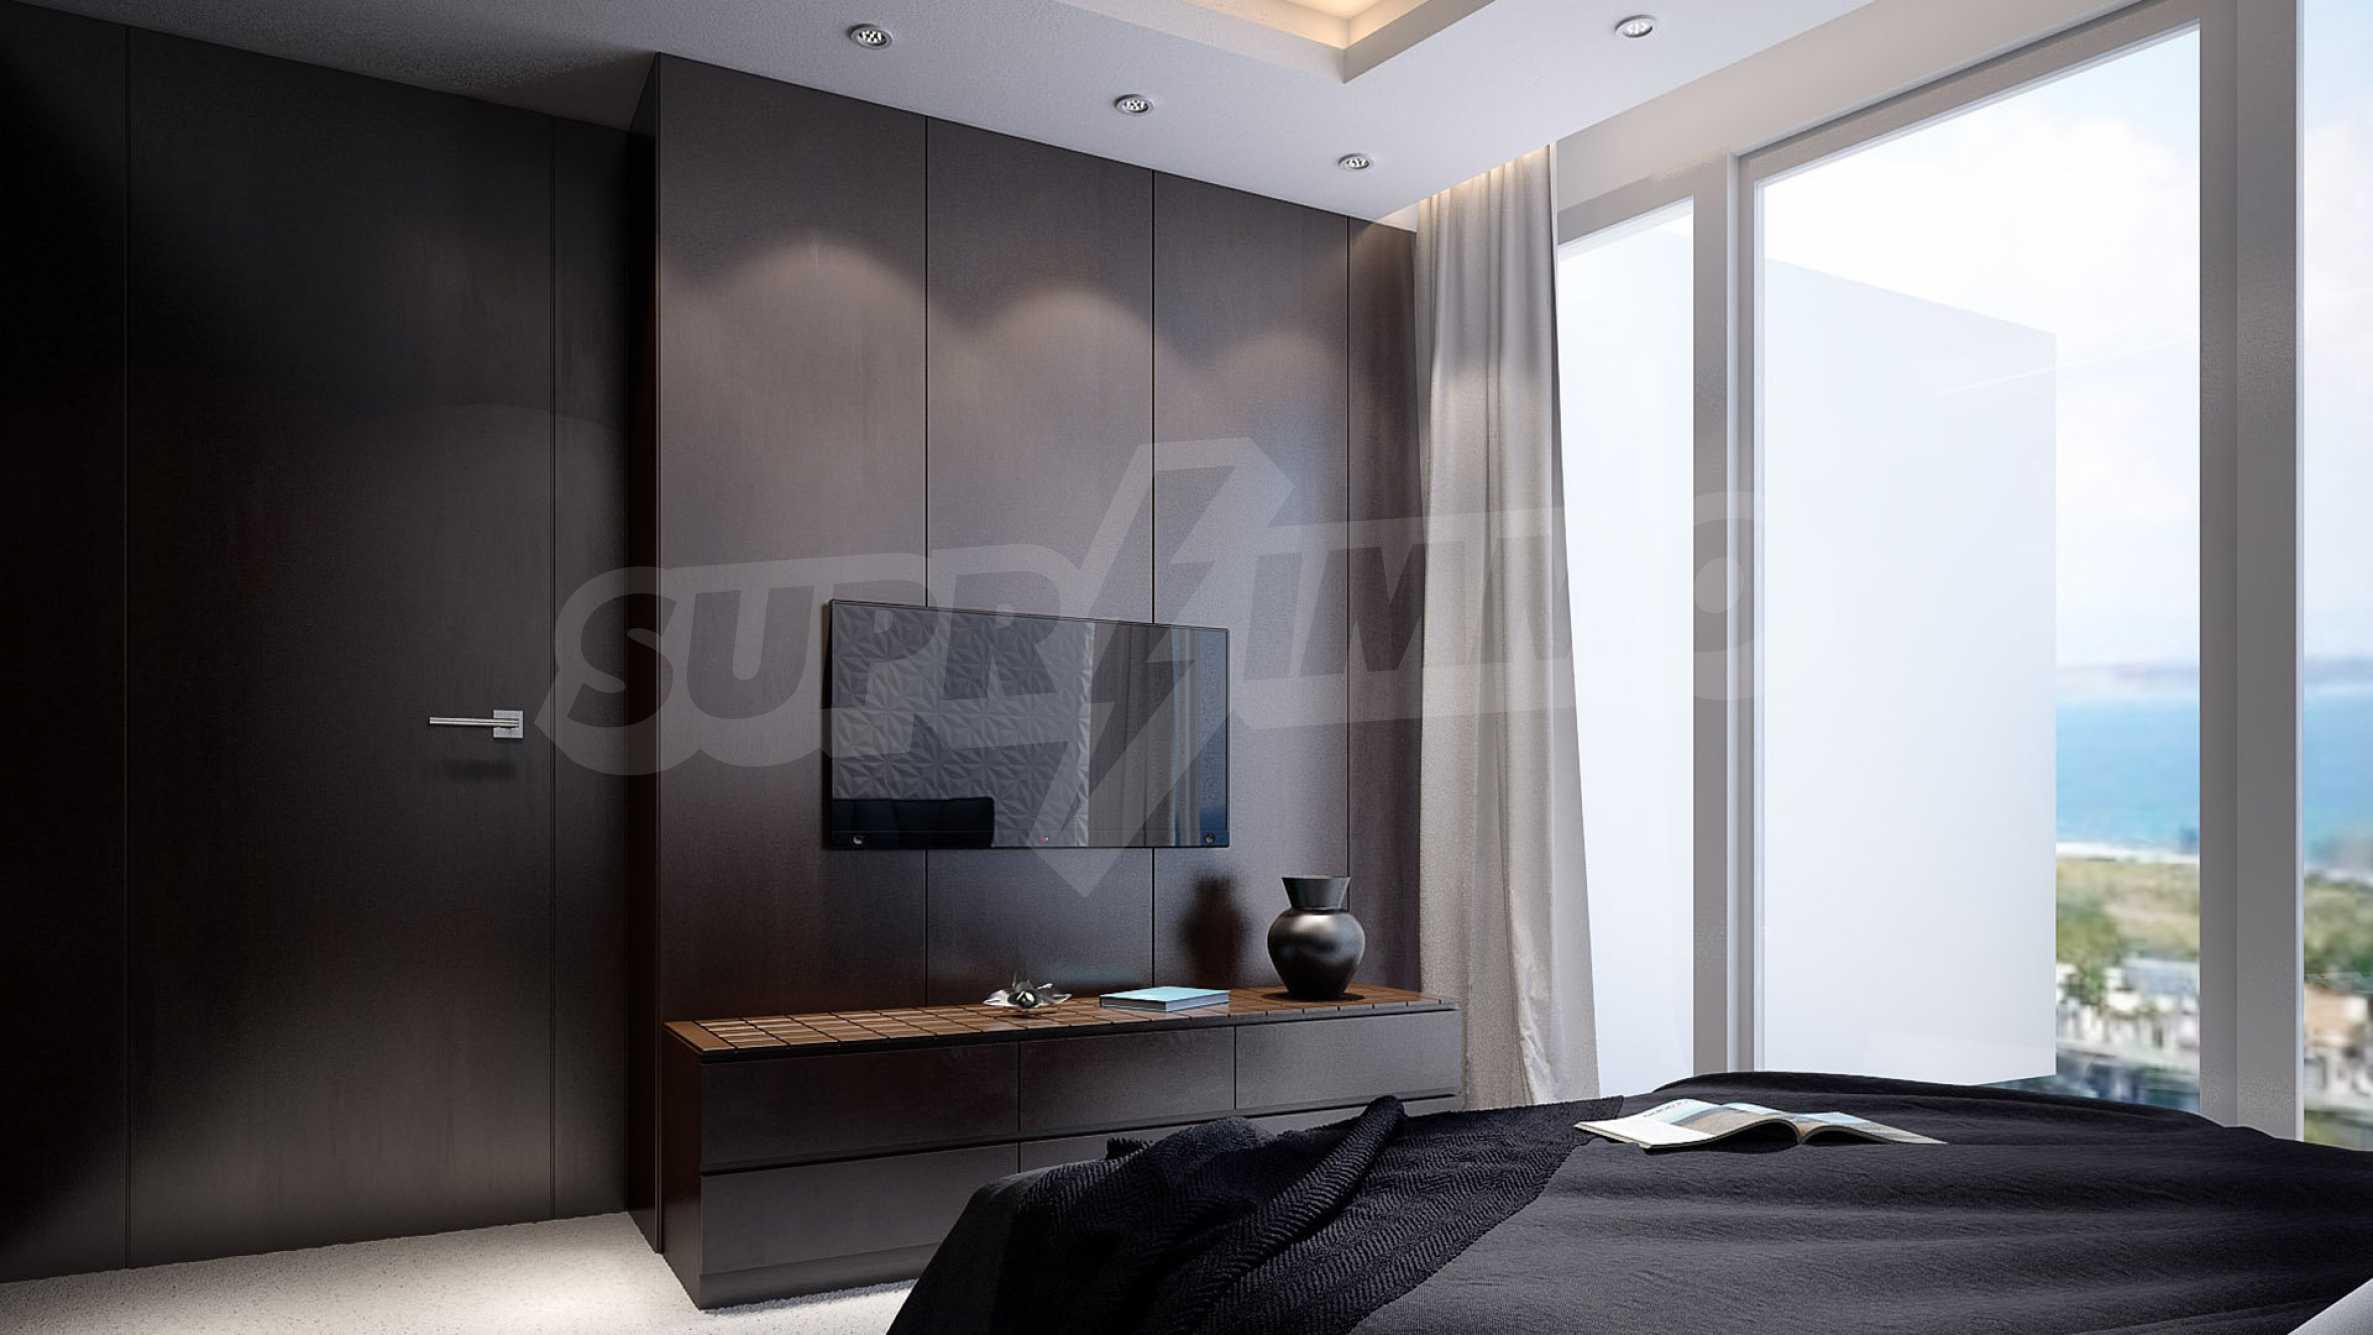 Нова сграда с луксозни апартаменти в гр. Бургас 33